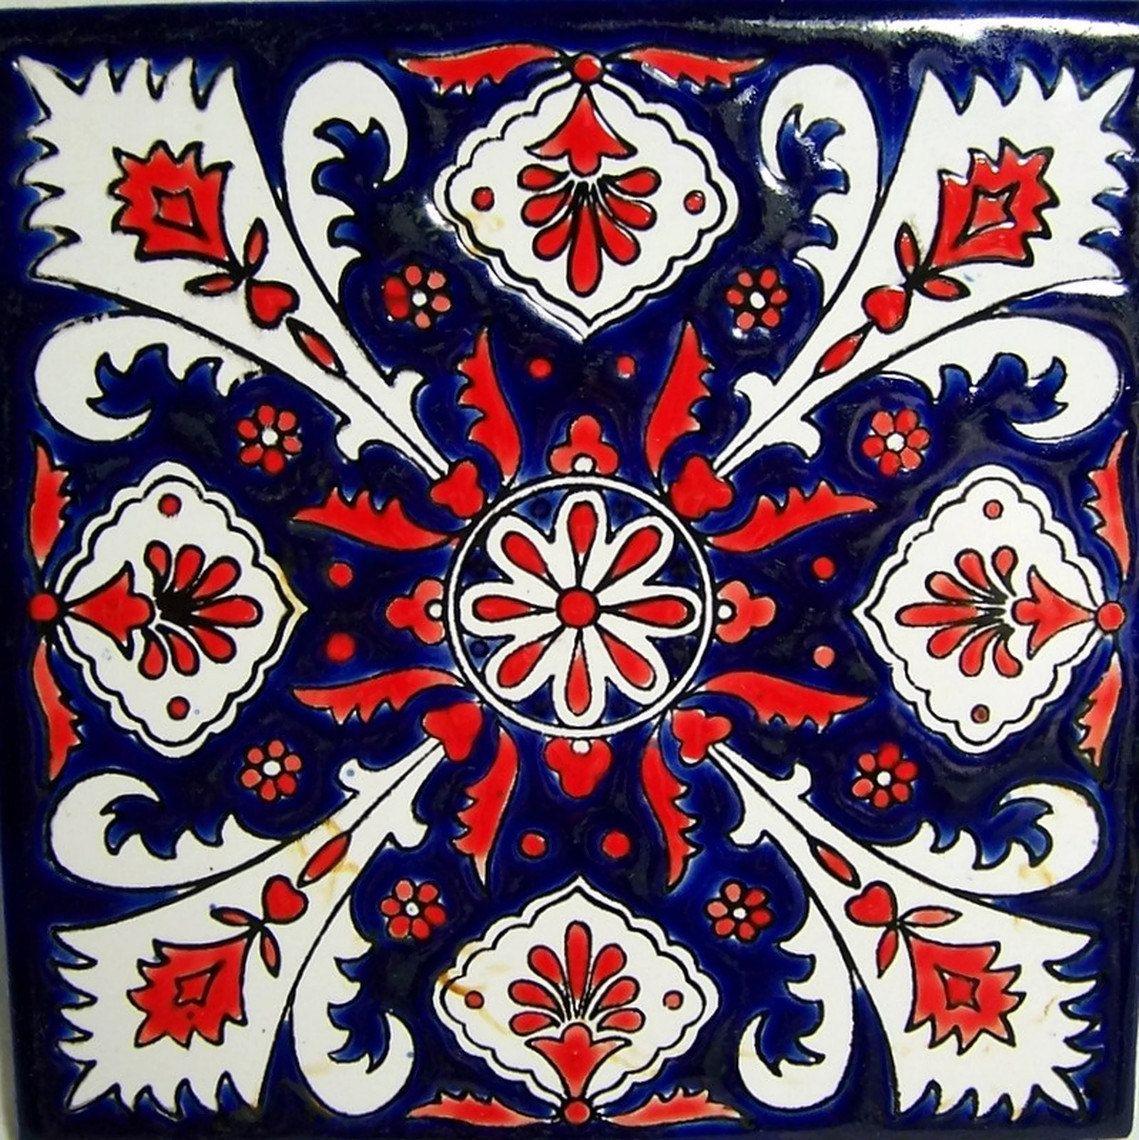 Vintage ceramic tile trivet desen pinterest vintage ceramic vintage ceramic tile trivet dailygadgetfo Choice Image